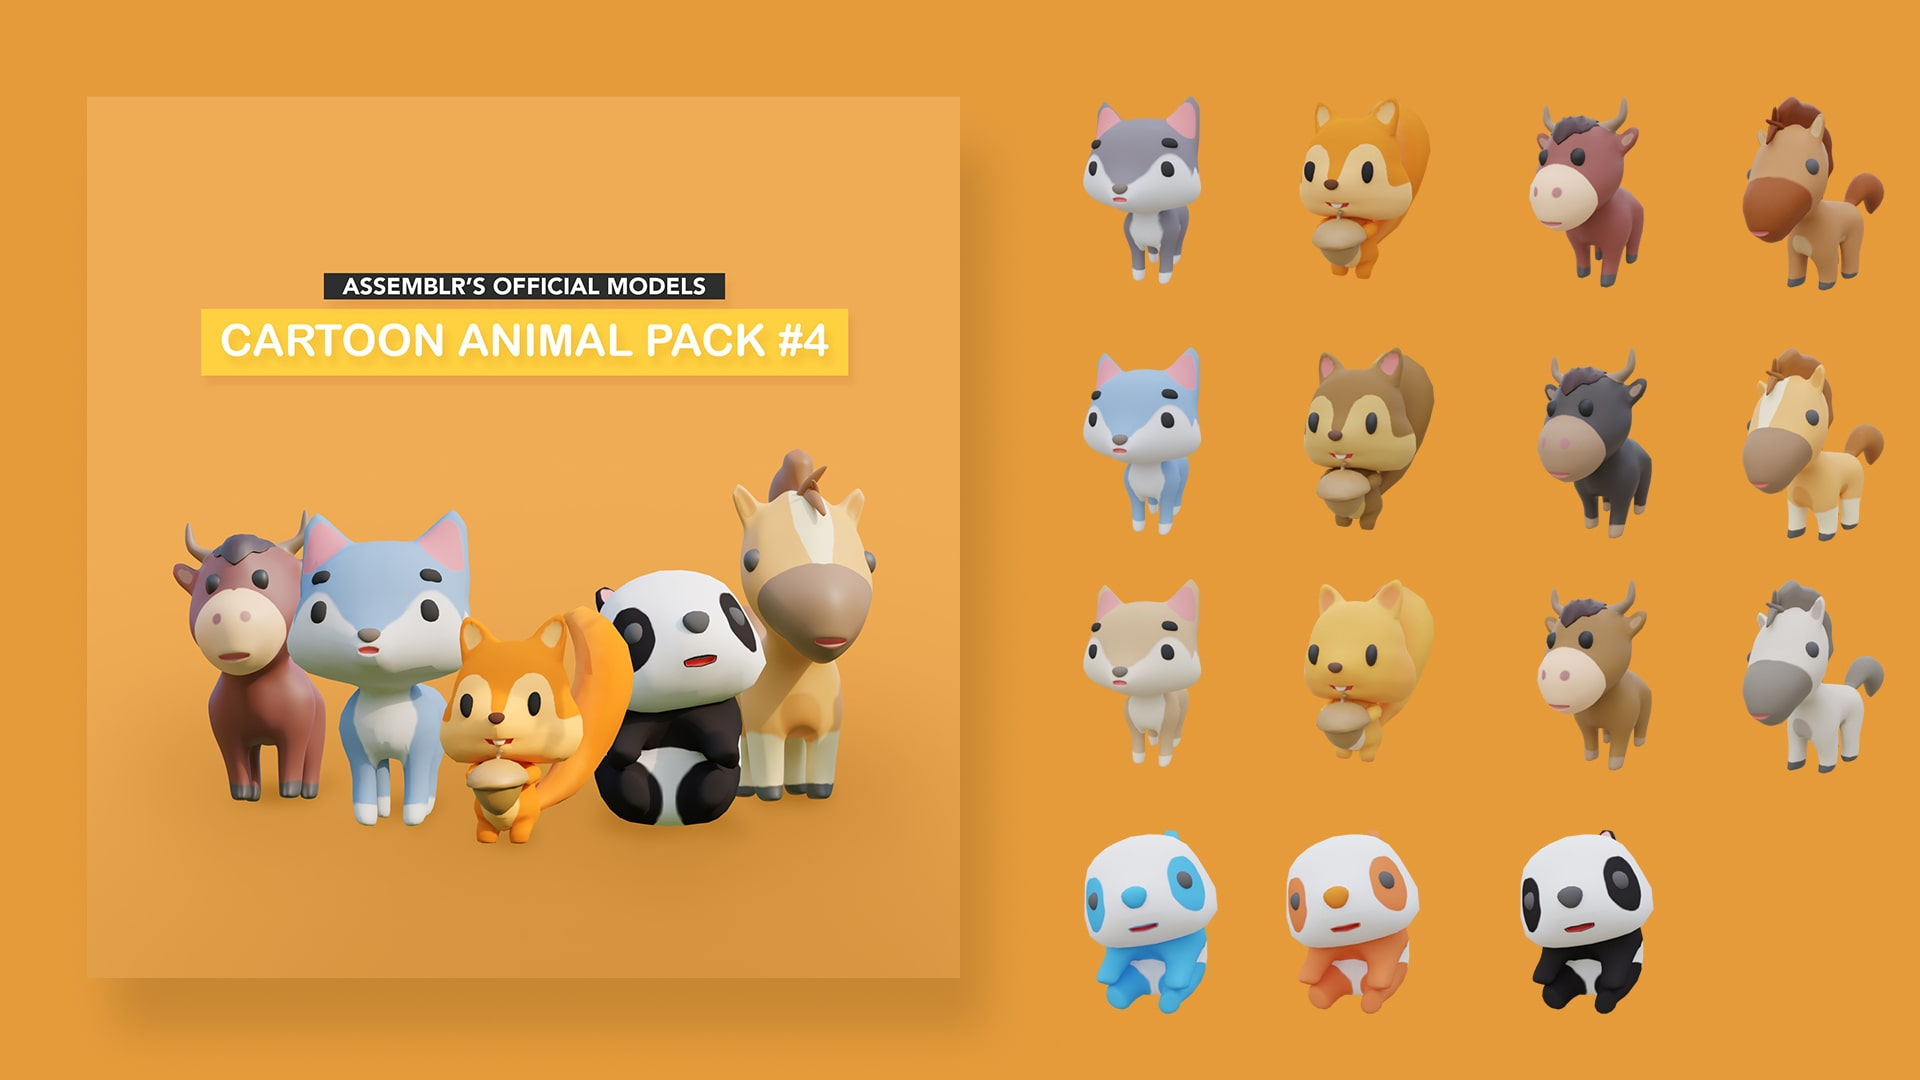 Cartoon animal pack #4